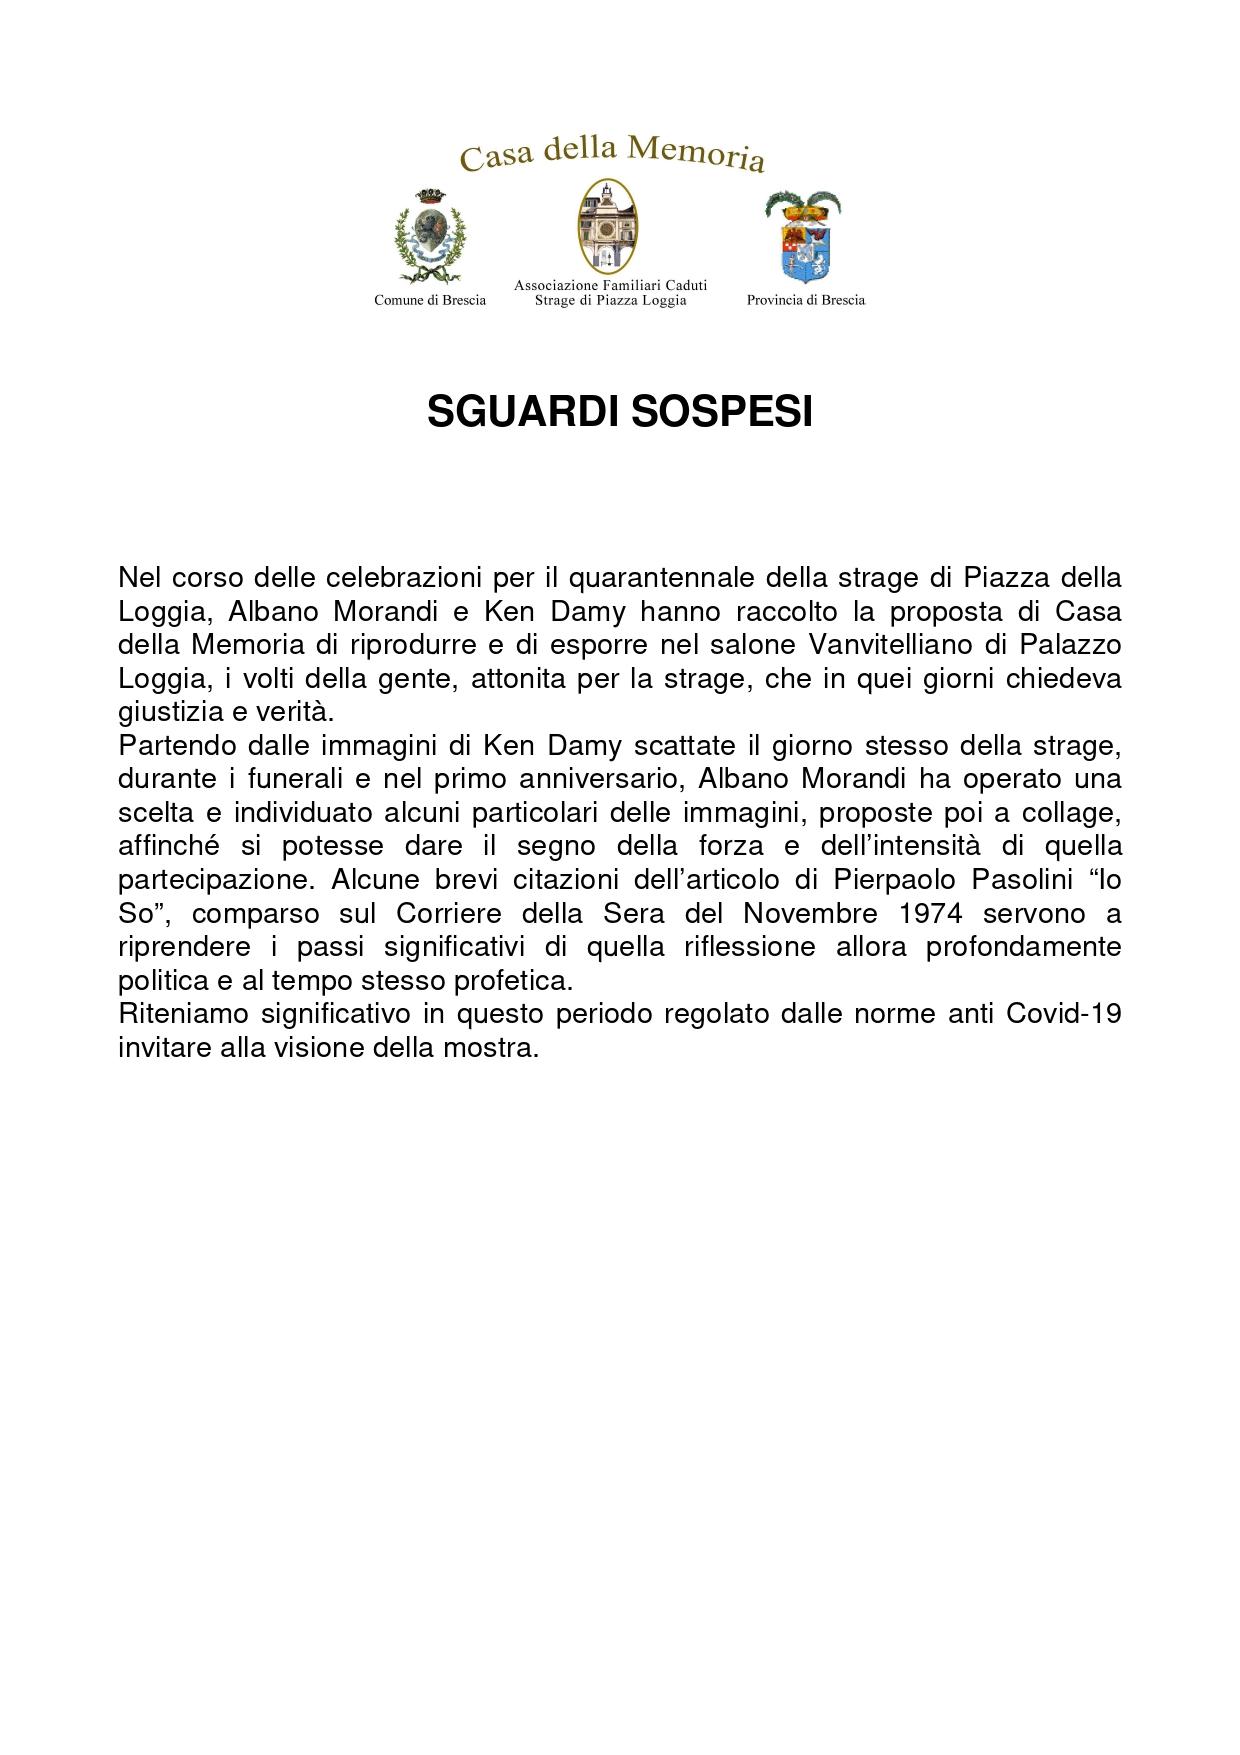 28.5.20 sguardi sospesi_page-0001